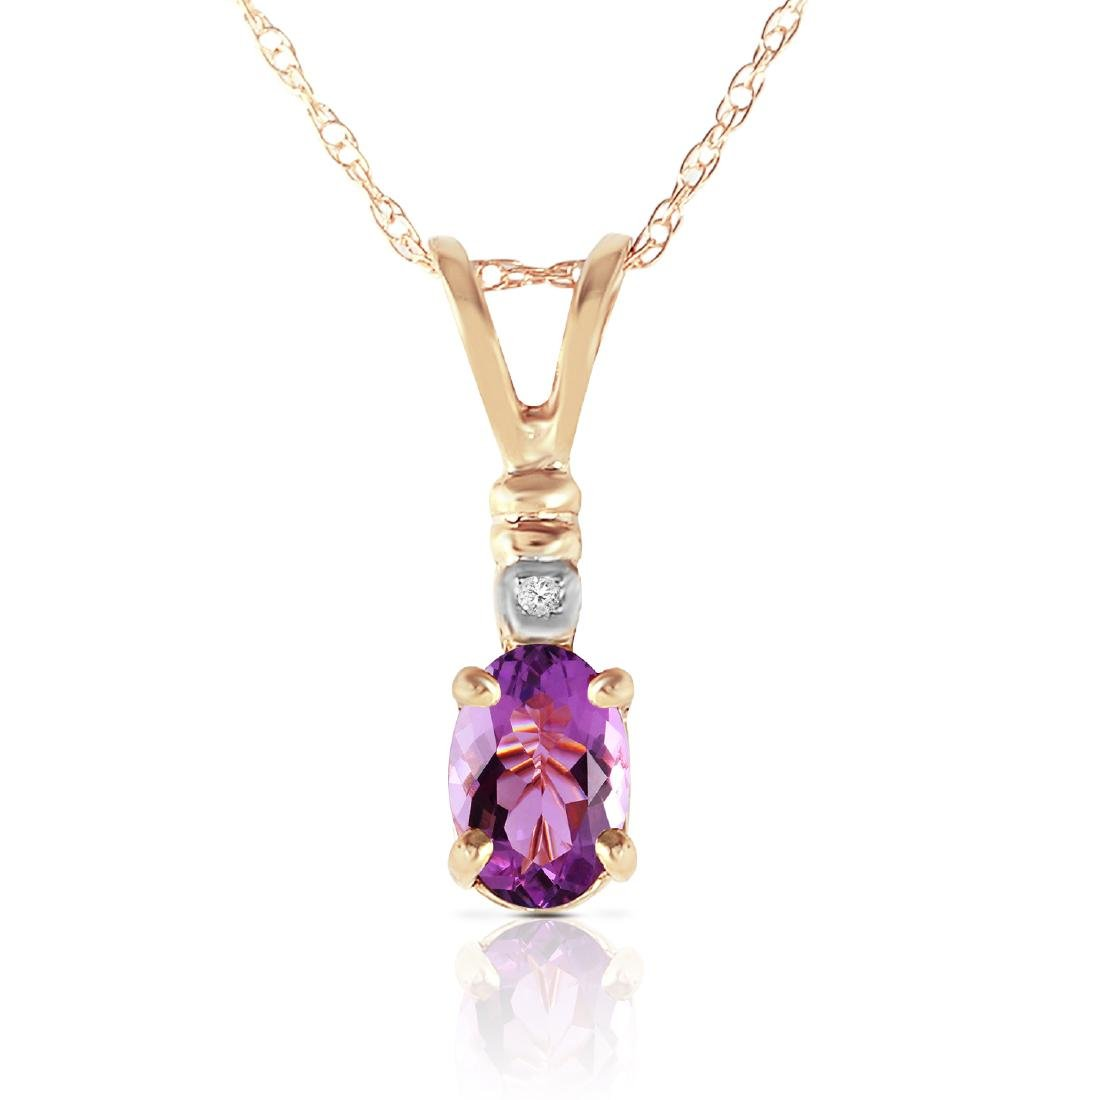 Genuine 0.46 ctw Amethyst & Diamond Necklace Jewelry